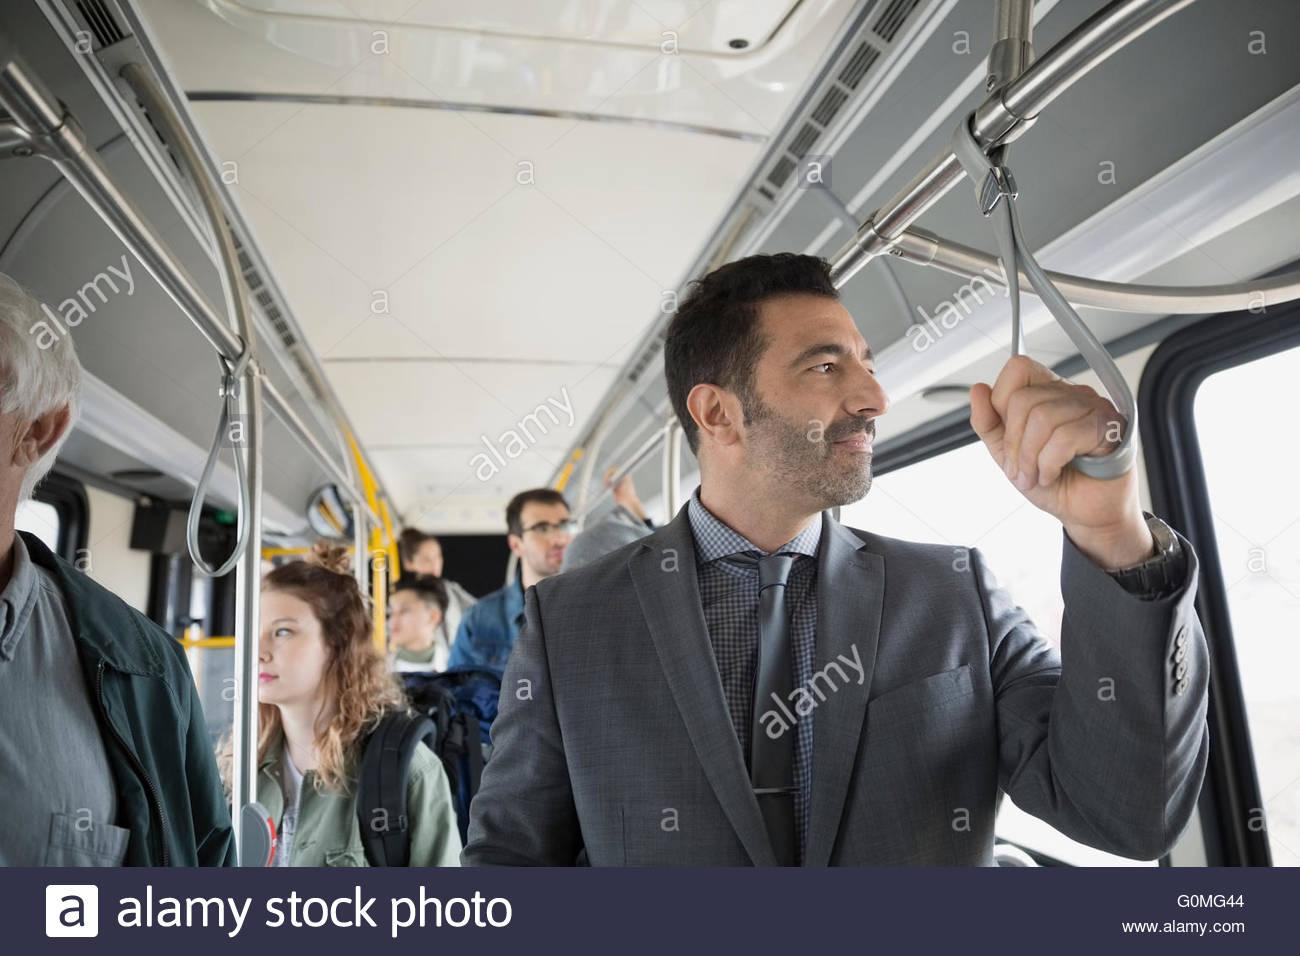 Businessman standing riding bus - Stock Image